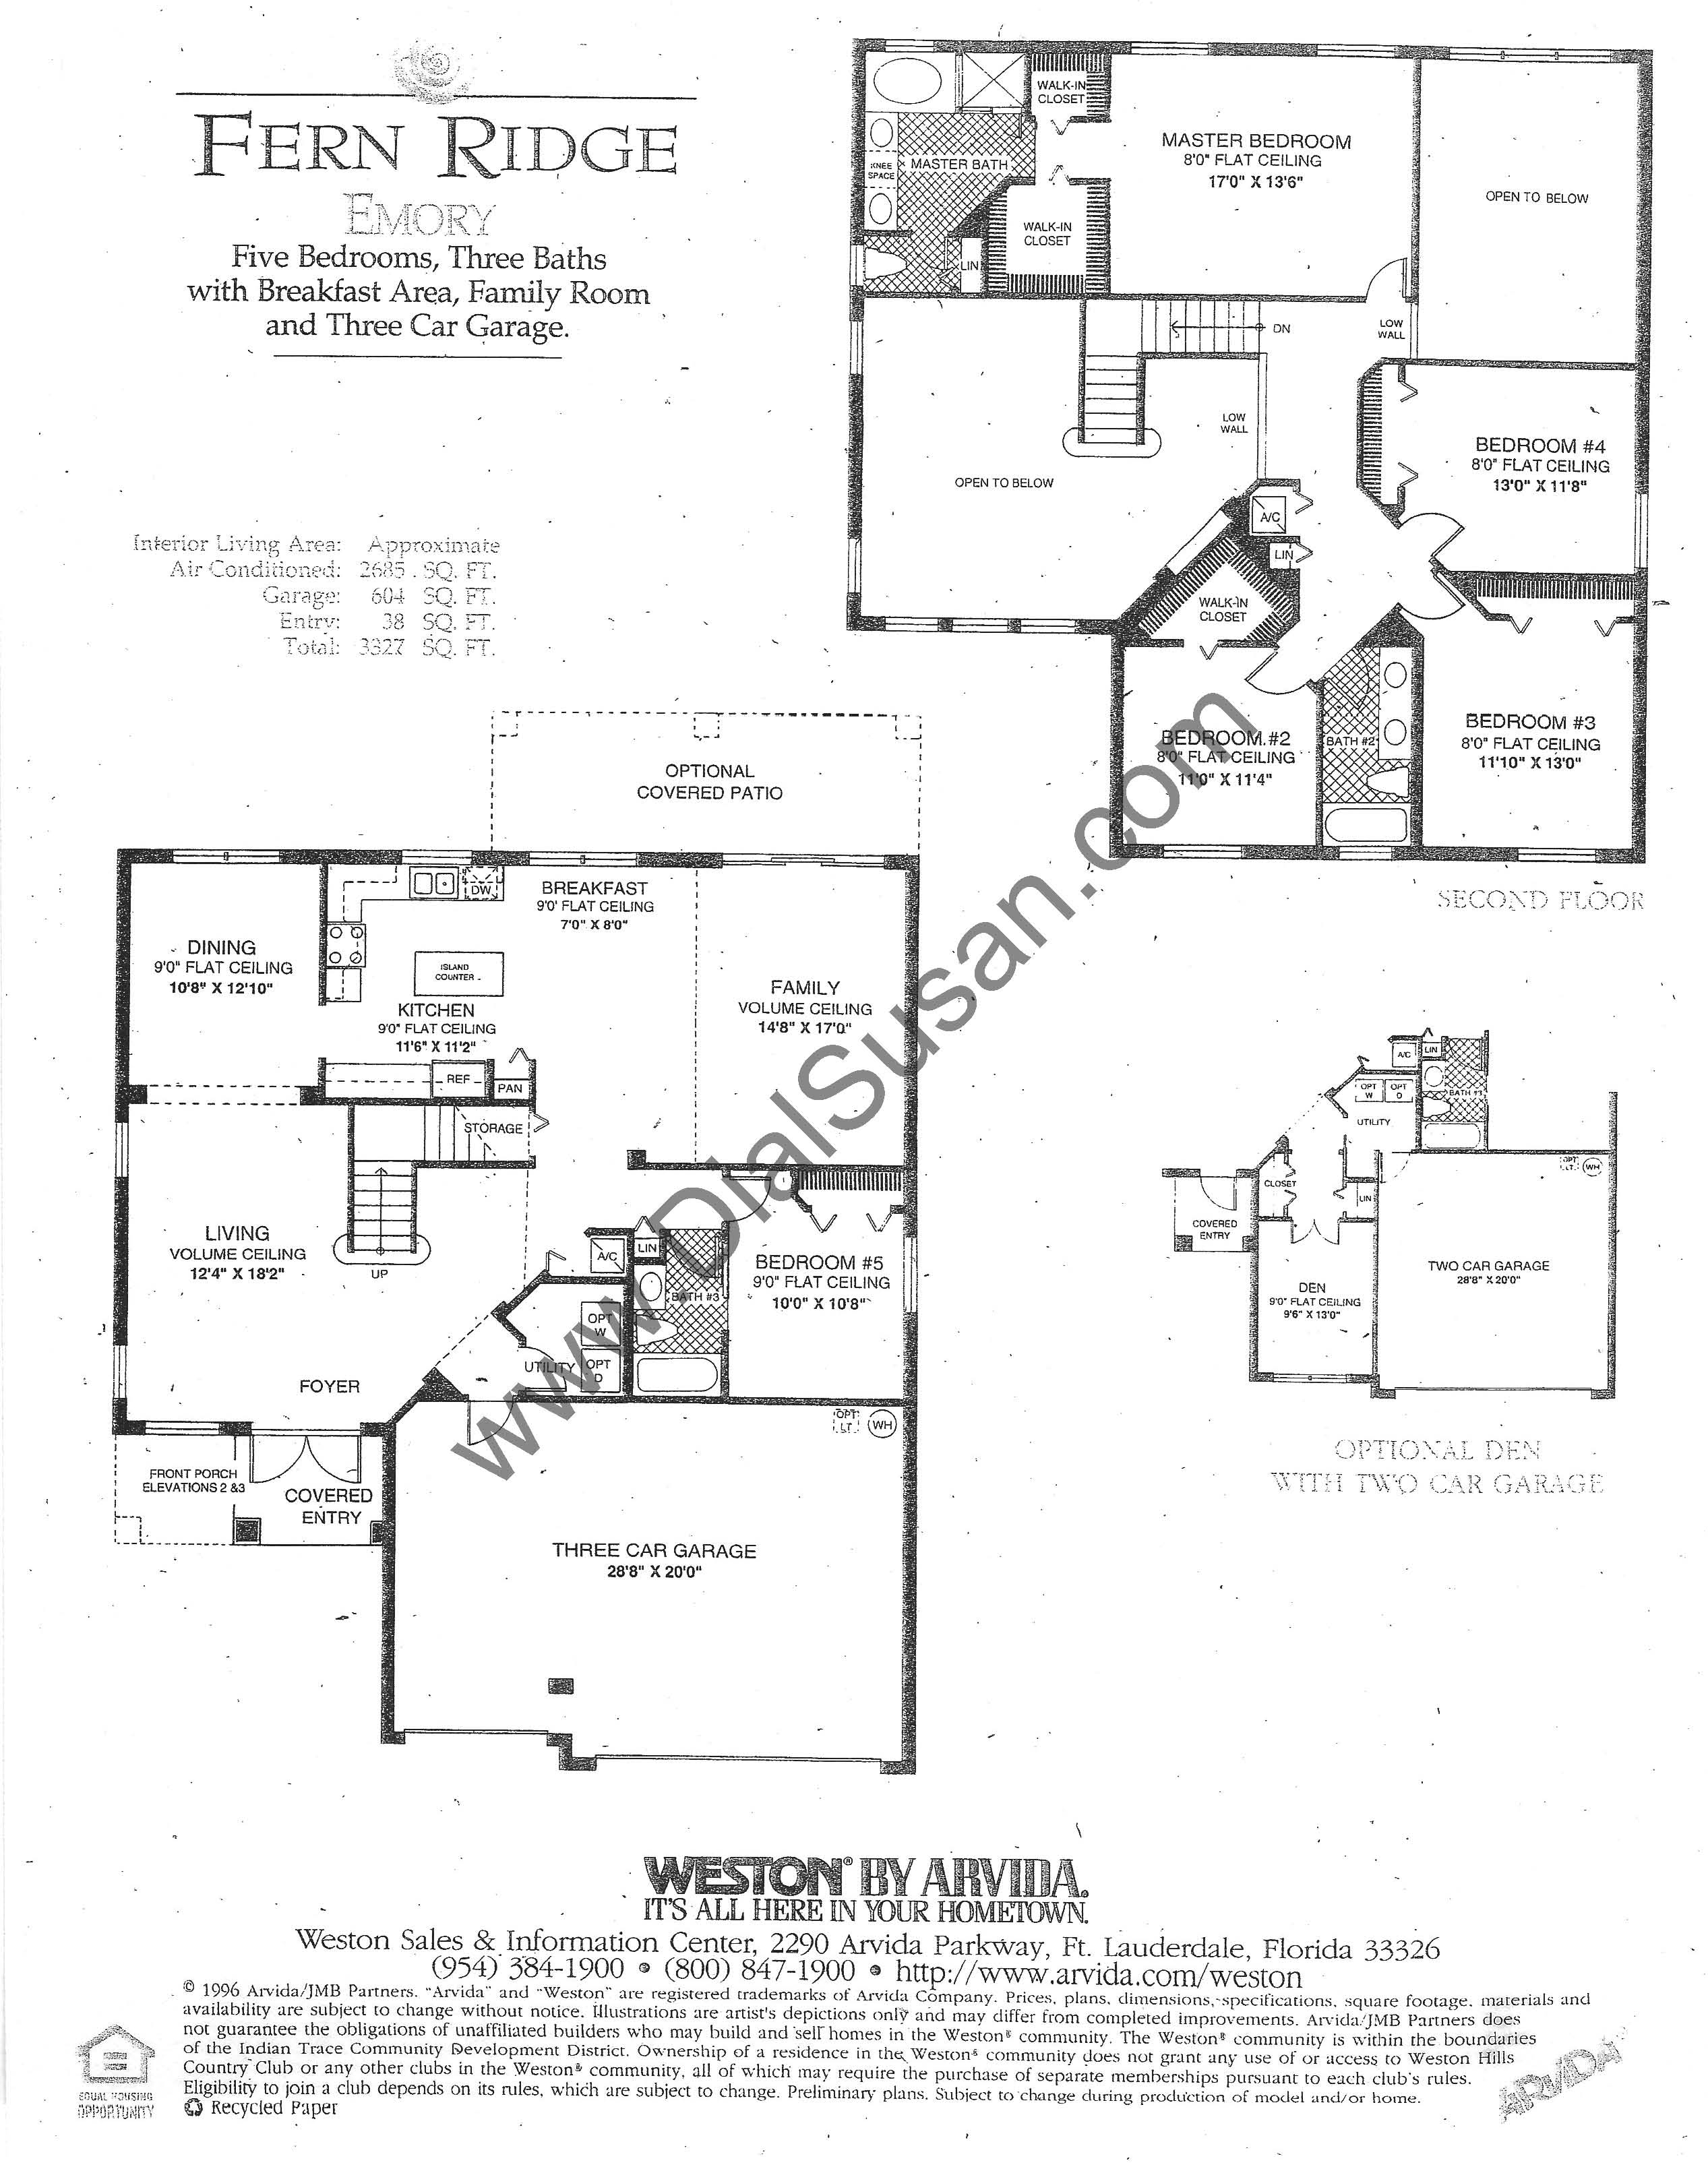 Fern Ridge 05 Emory susan hesselman realtor in the ridges,Arvida Homes Floor Plans